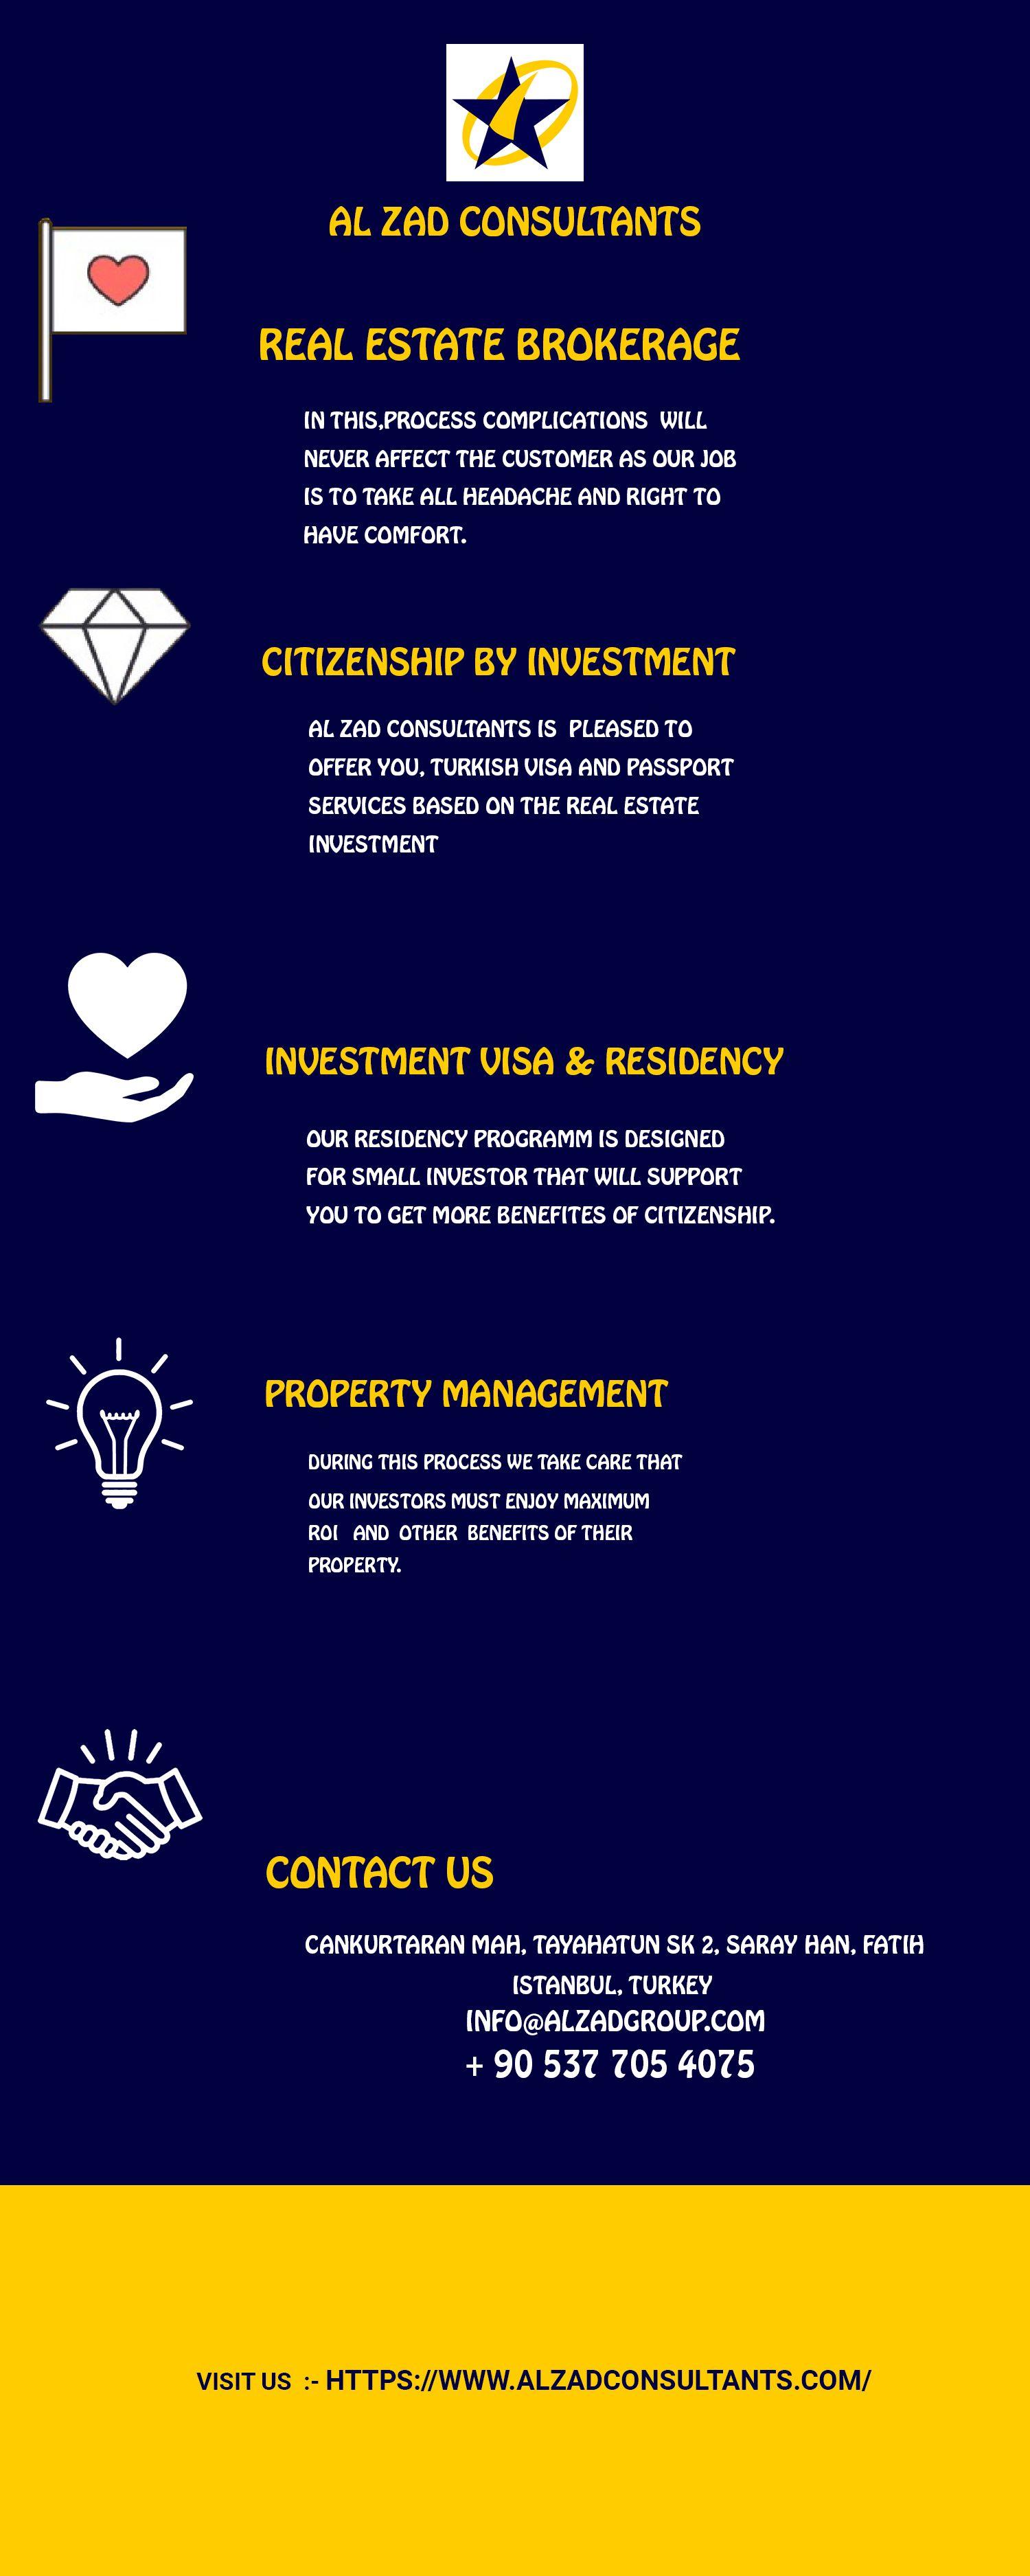 Real Estate Management In 2020 Real Estate Management Brokerage Firm Real Estate